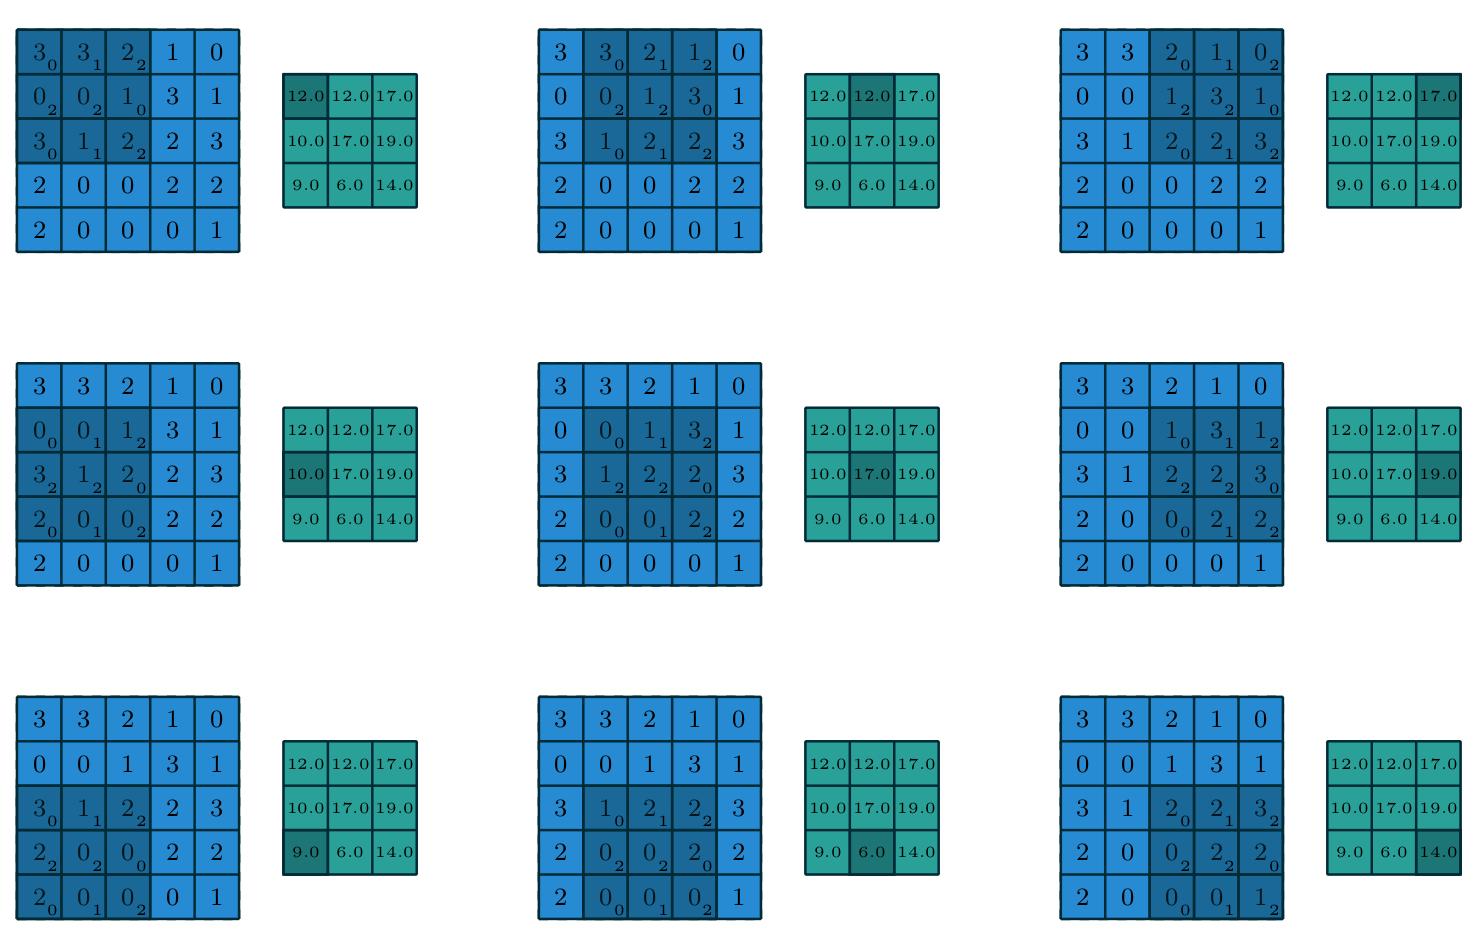 conv-nn-bigmax-2019/output_discrete_convolution.png